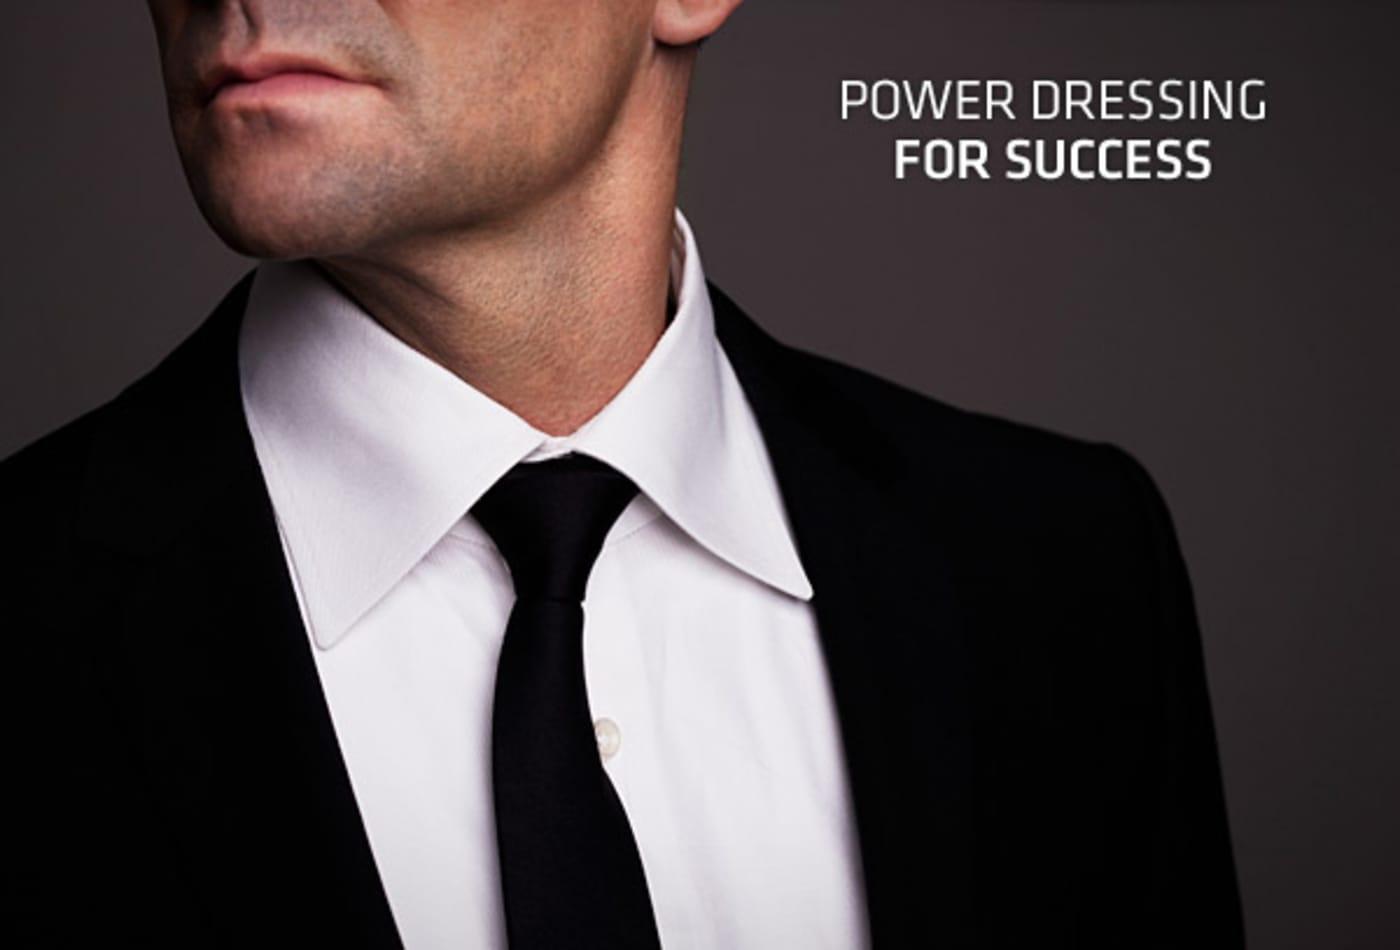 Power-dressing-sucess-cover.jpg